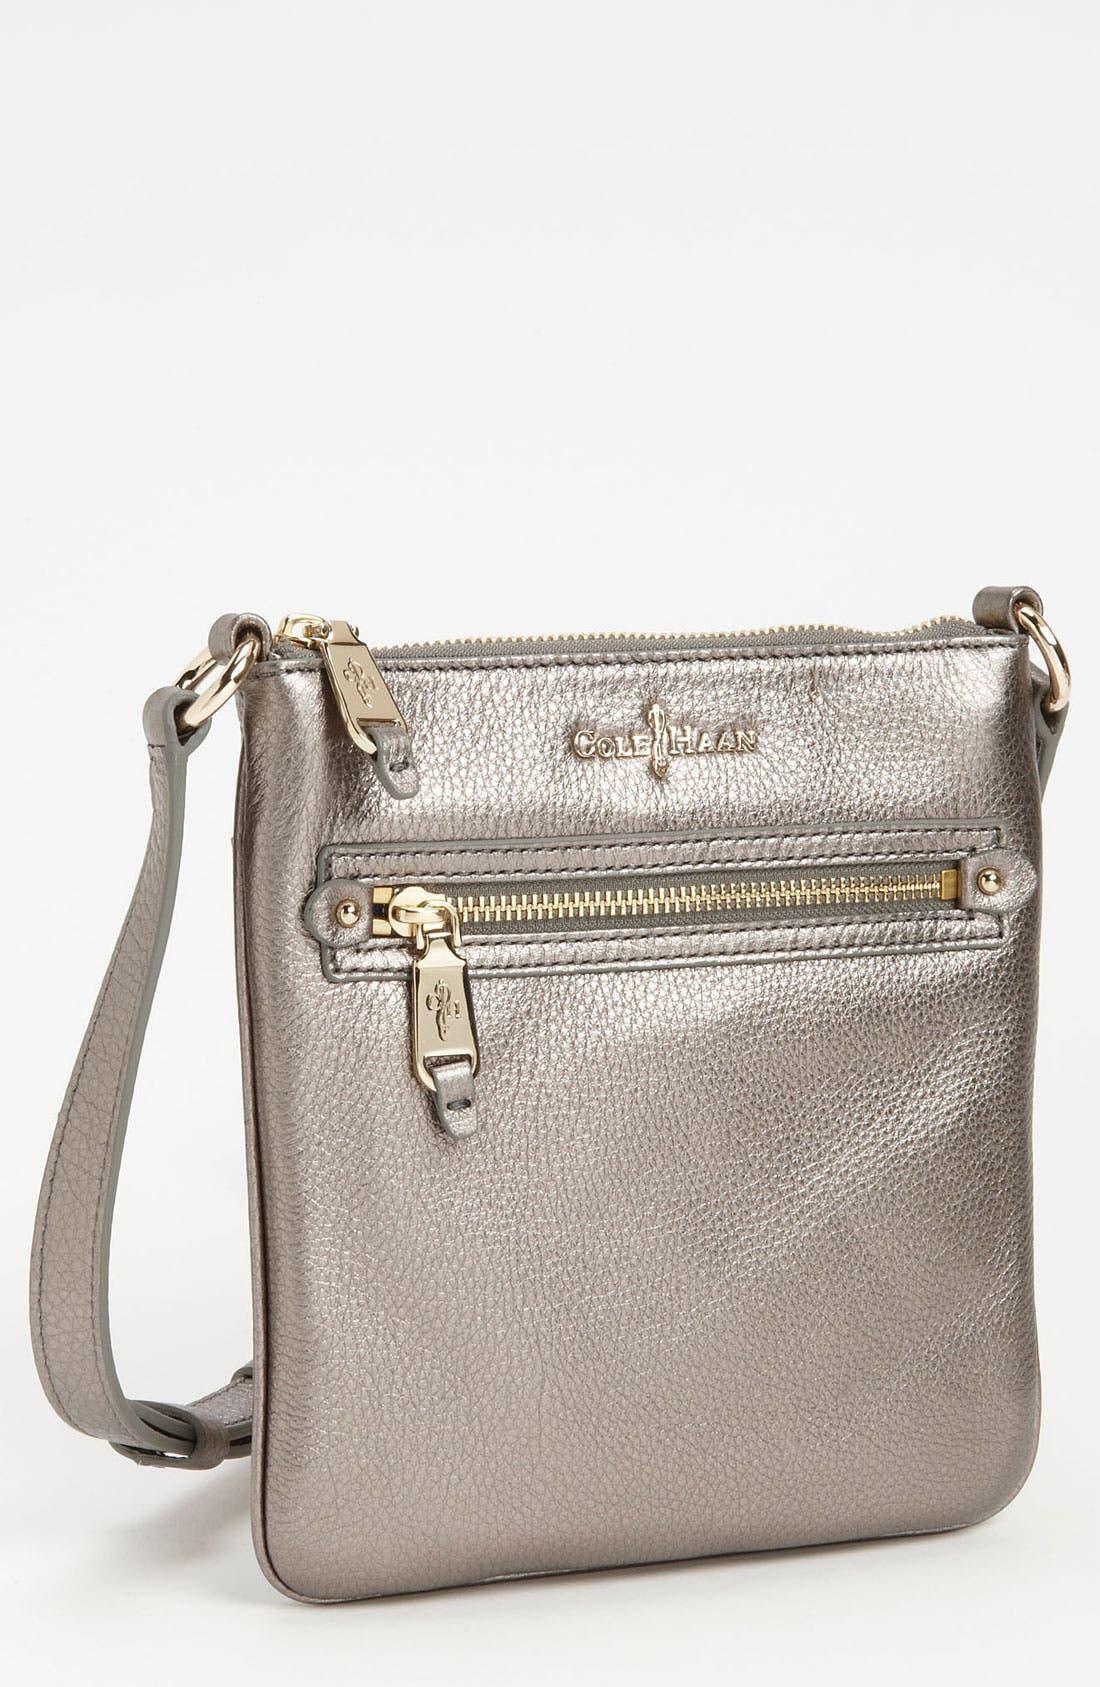 Alternate Image 1 Selected - Cole Haan 'Linley - Swing Pack' Crossbody Bag